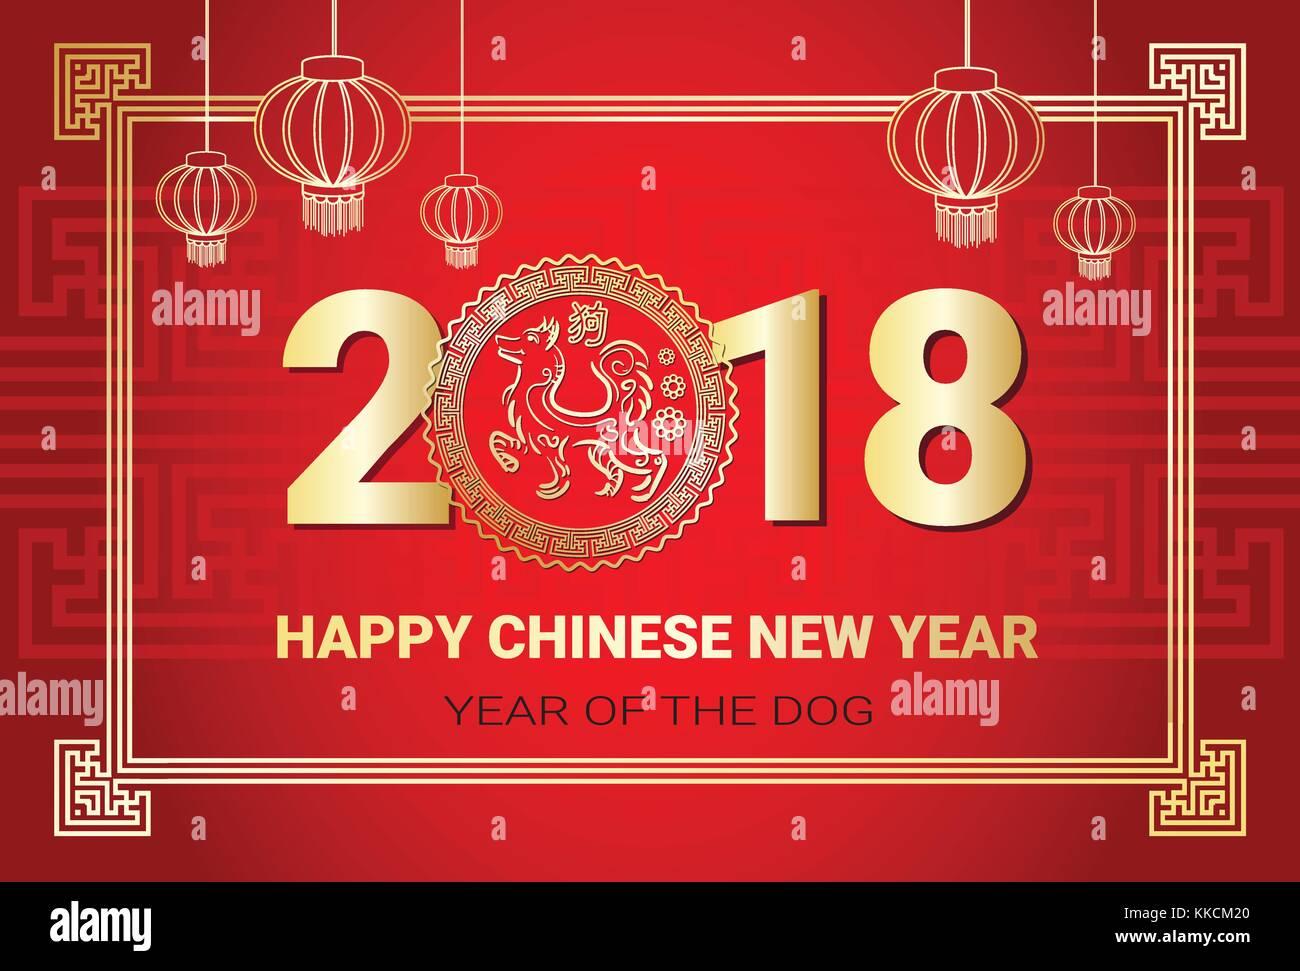 Happy chinese new year greeting card 2018 lunar dog symbol red and happy chinese new year greeting card 2018 lunar dog symbol red and golden colors m4hsunfo